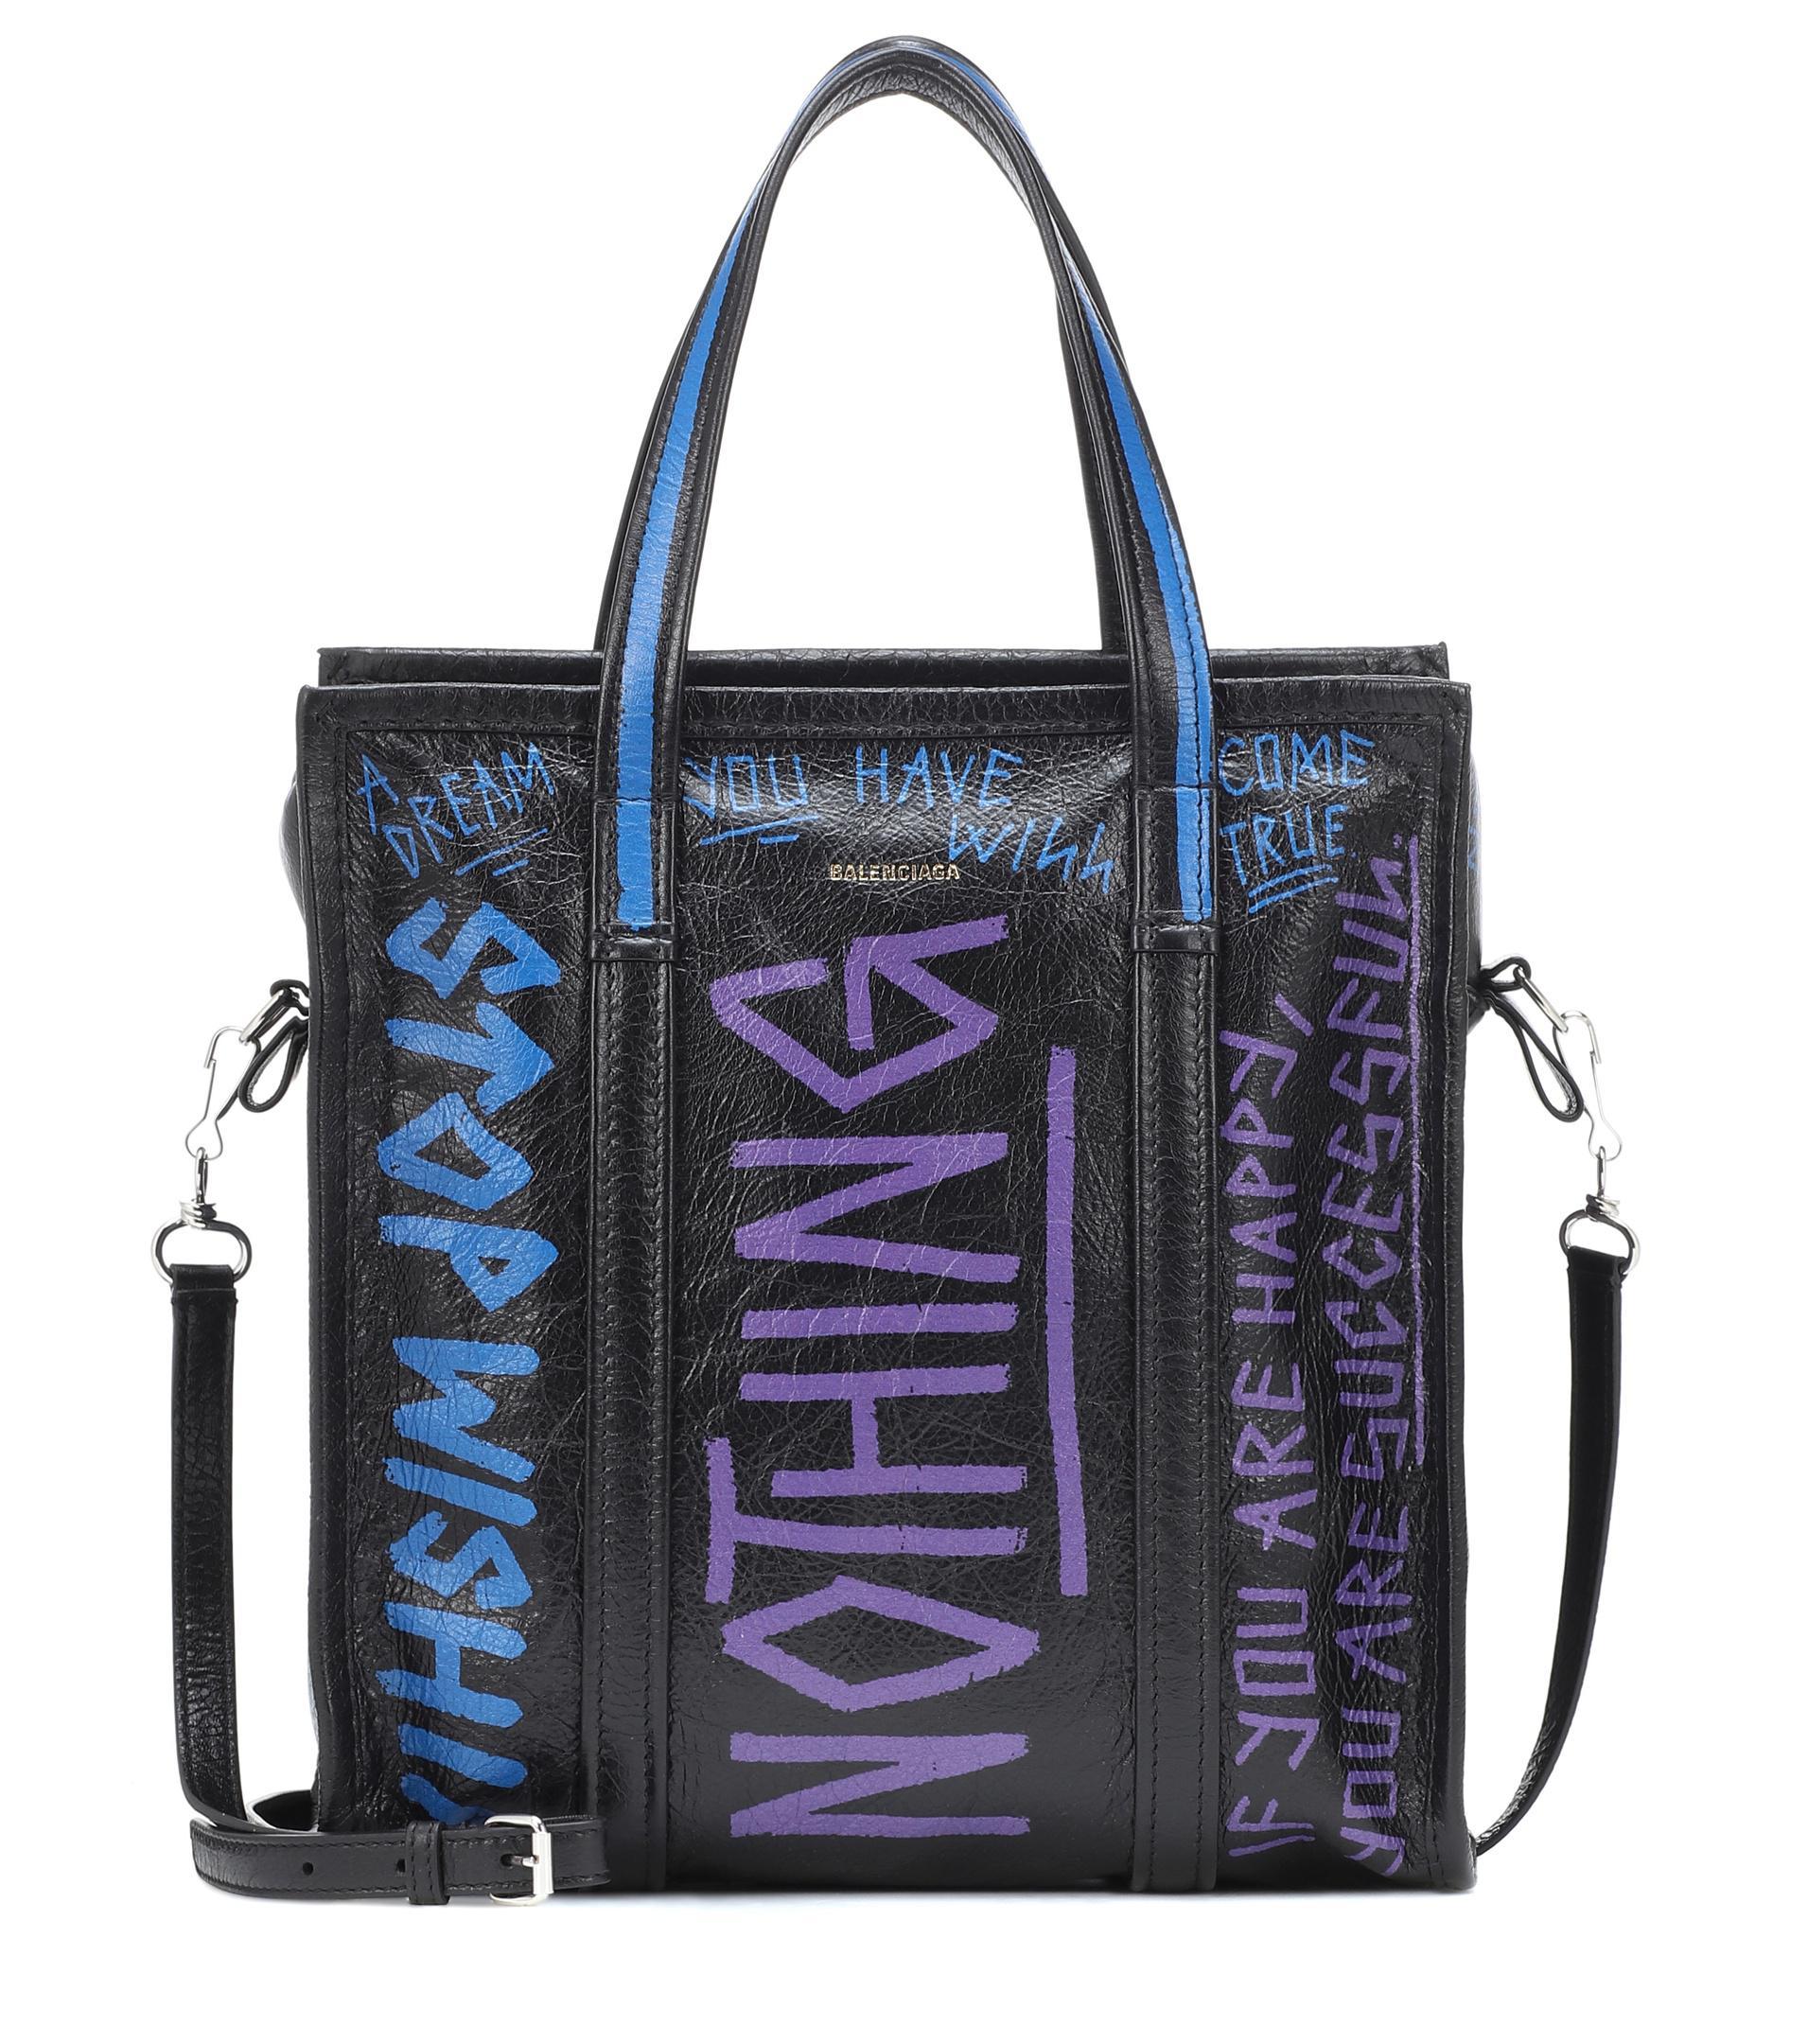 658233492d31 Lyst - Balenciaga Graffiti Bazar Shopper Tote Bag Leather Black blue ...